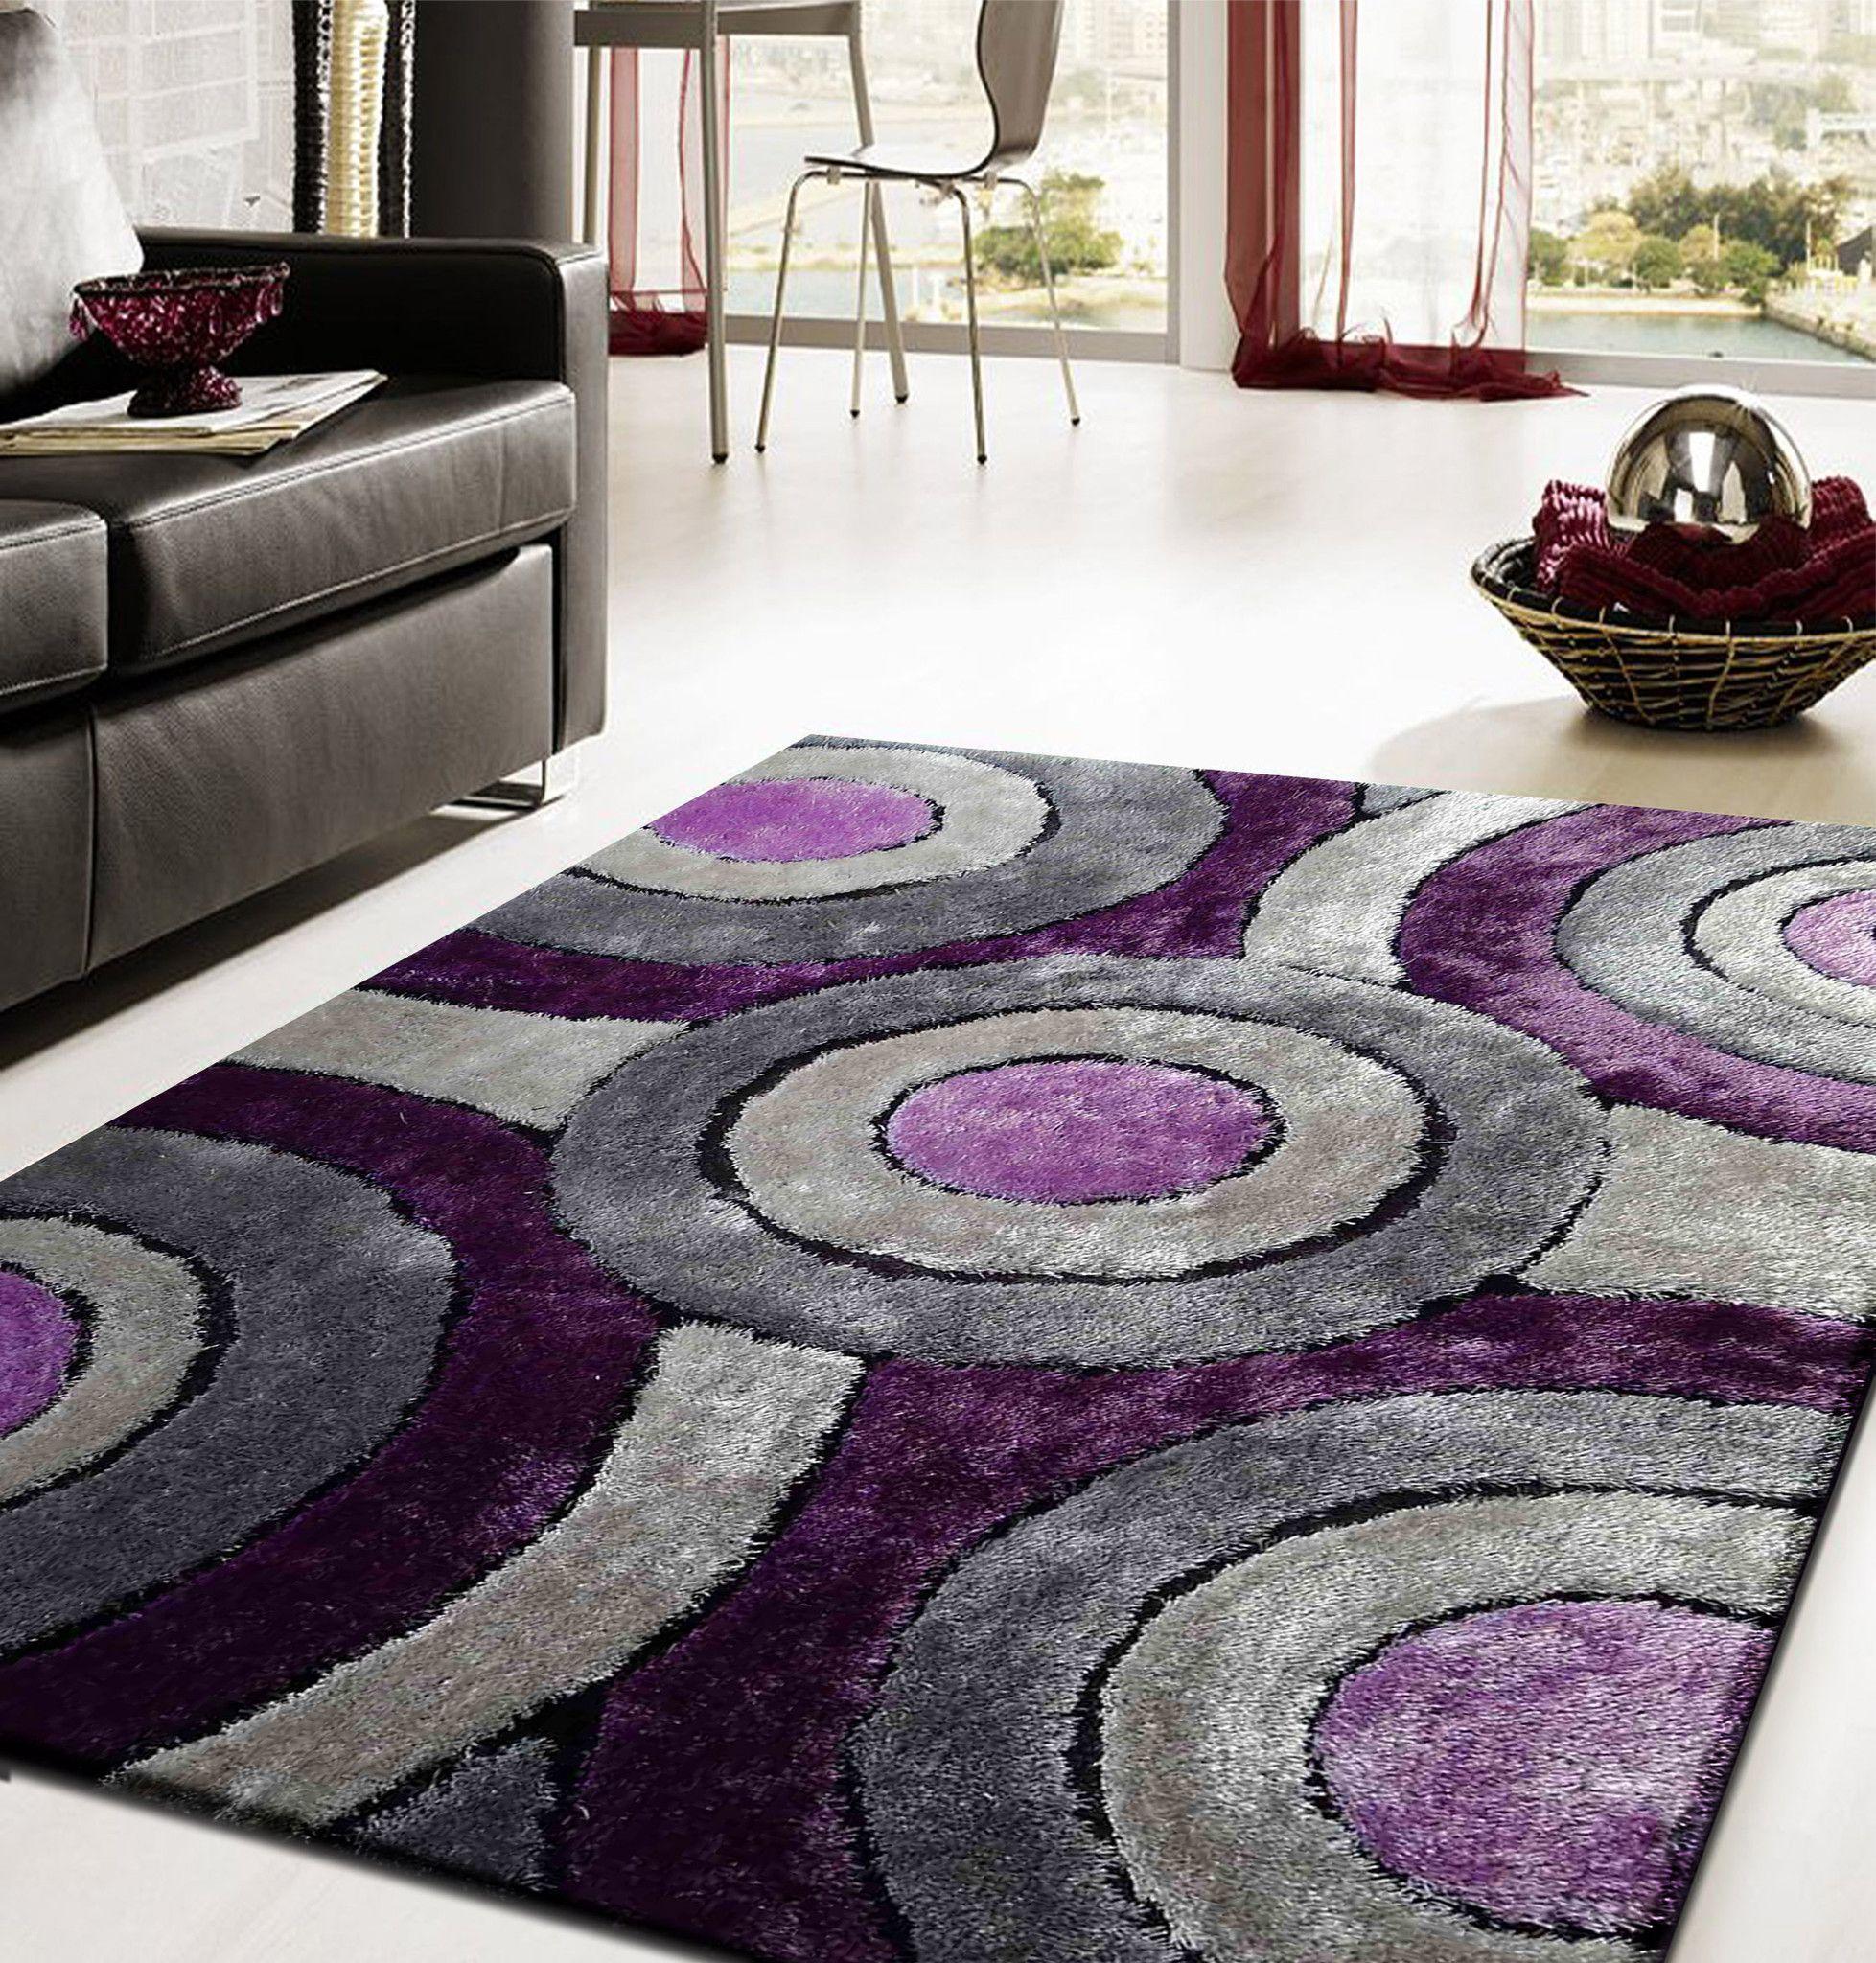 No 110gray Purple Jpg 1 957 2 048 Pixels Living Room Decor Purple Purple Living Room Purple Home Decor